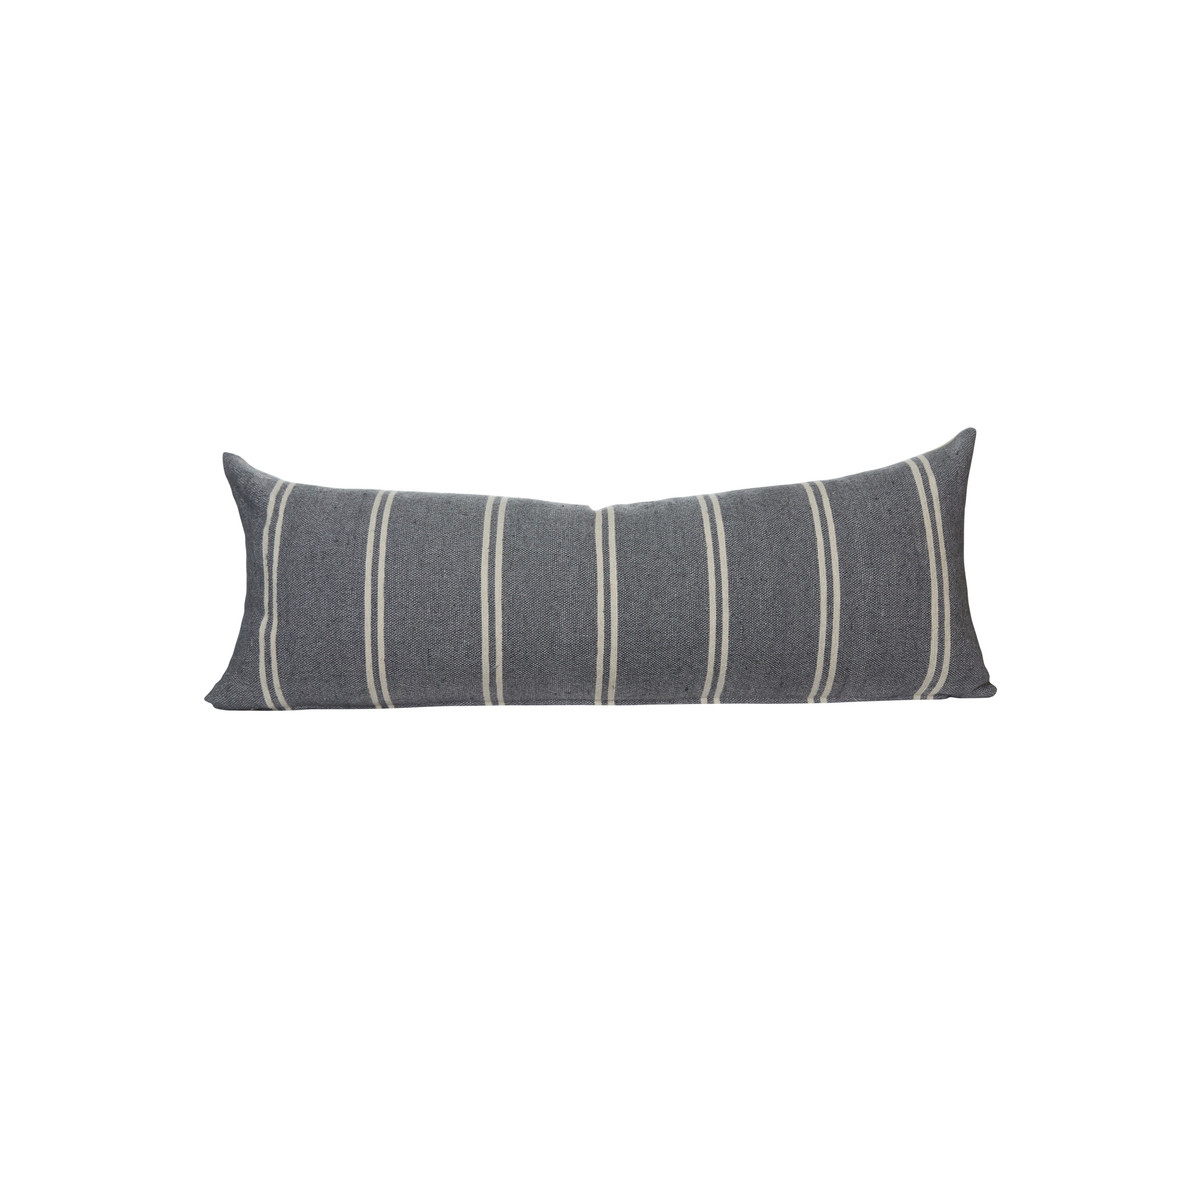 French Gray Capri Stripe  14 x 36 Decorative Lumbar - Front